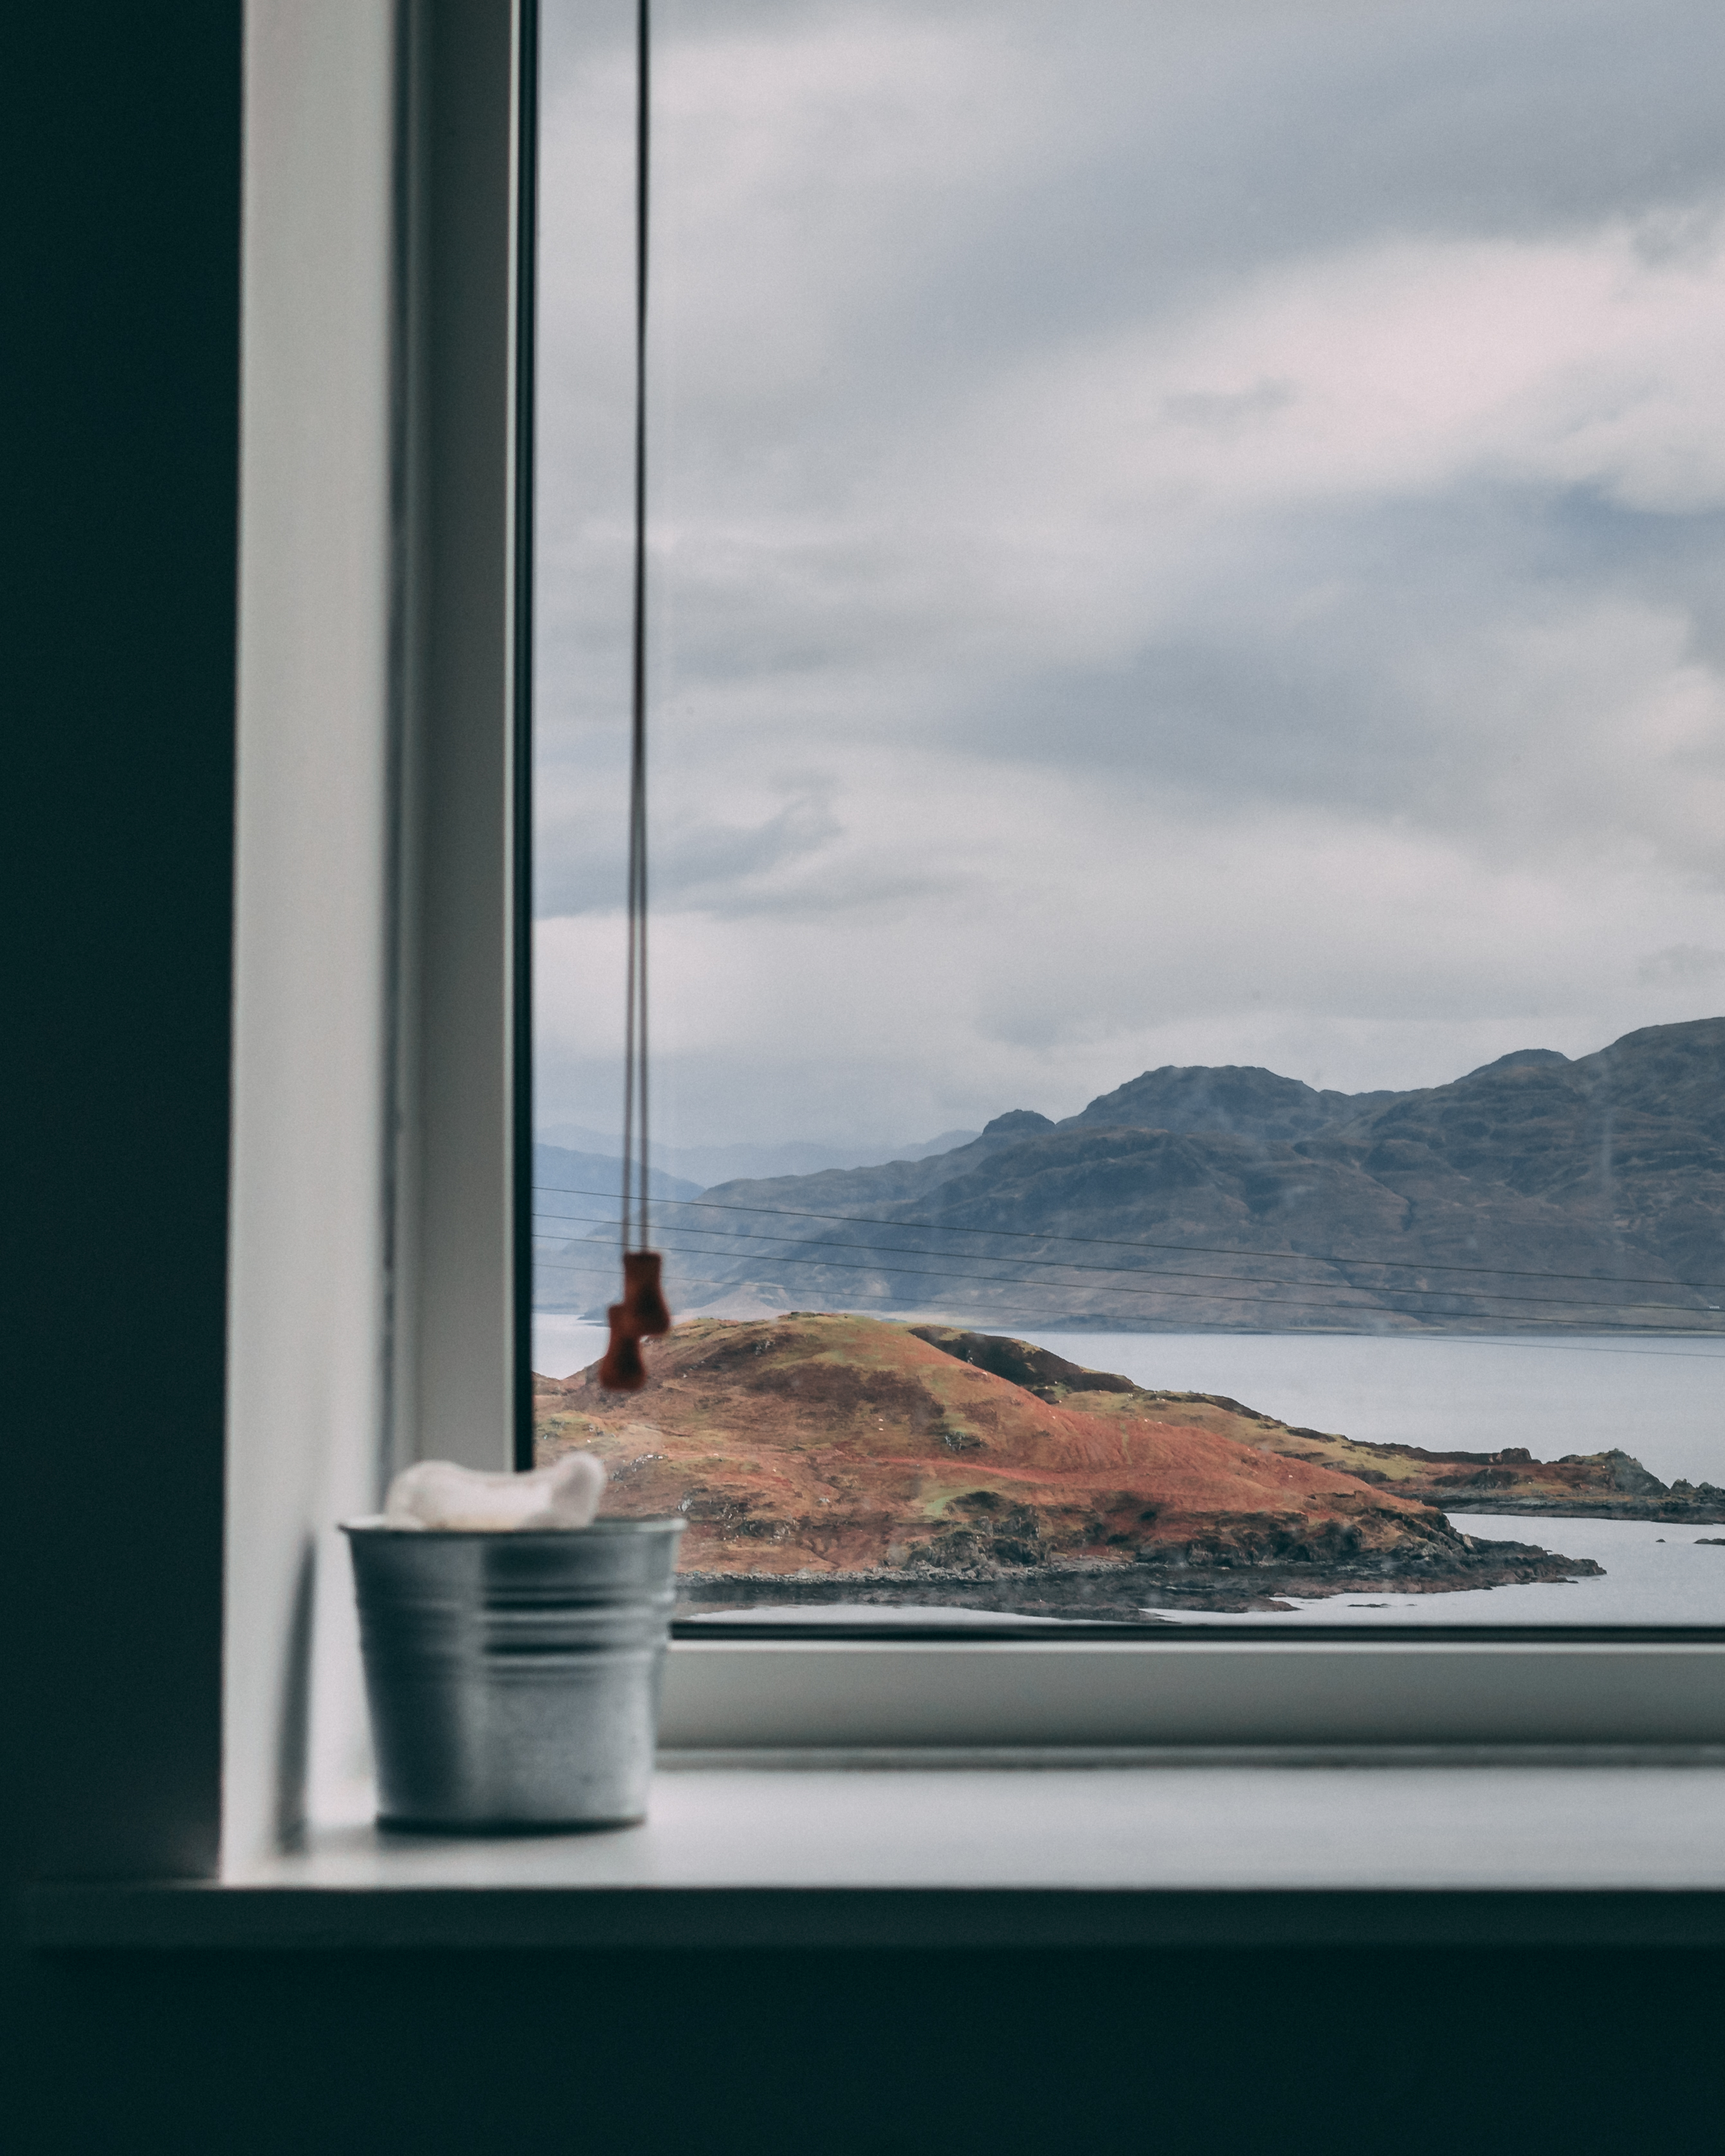 Luxury Isle of Skye Self Catering Holiday Accommodation | Vacation Rental 2020